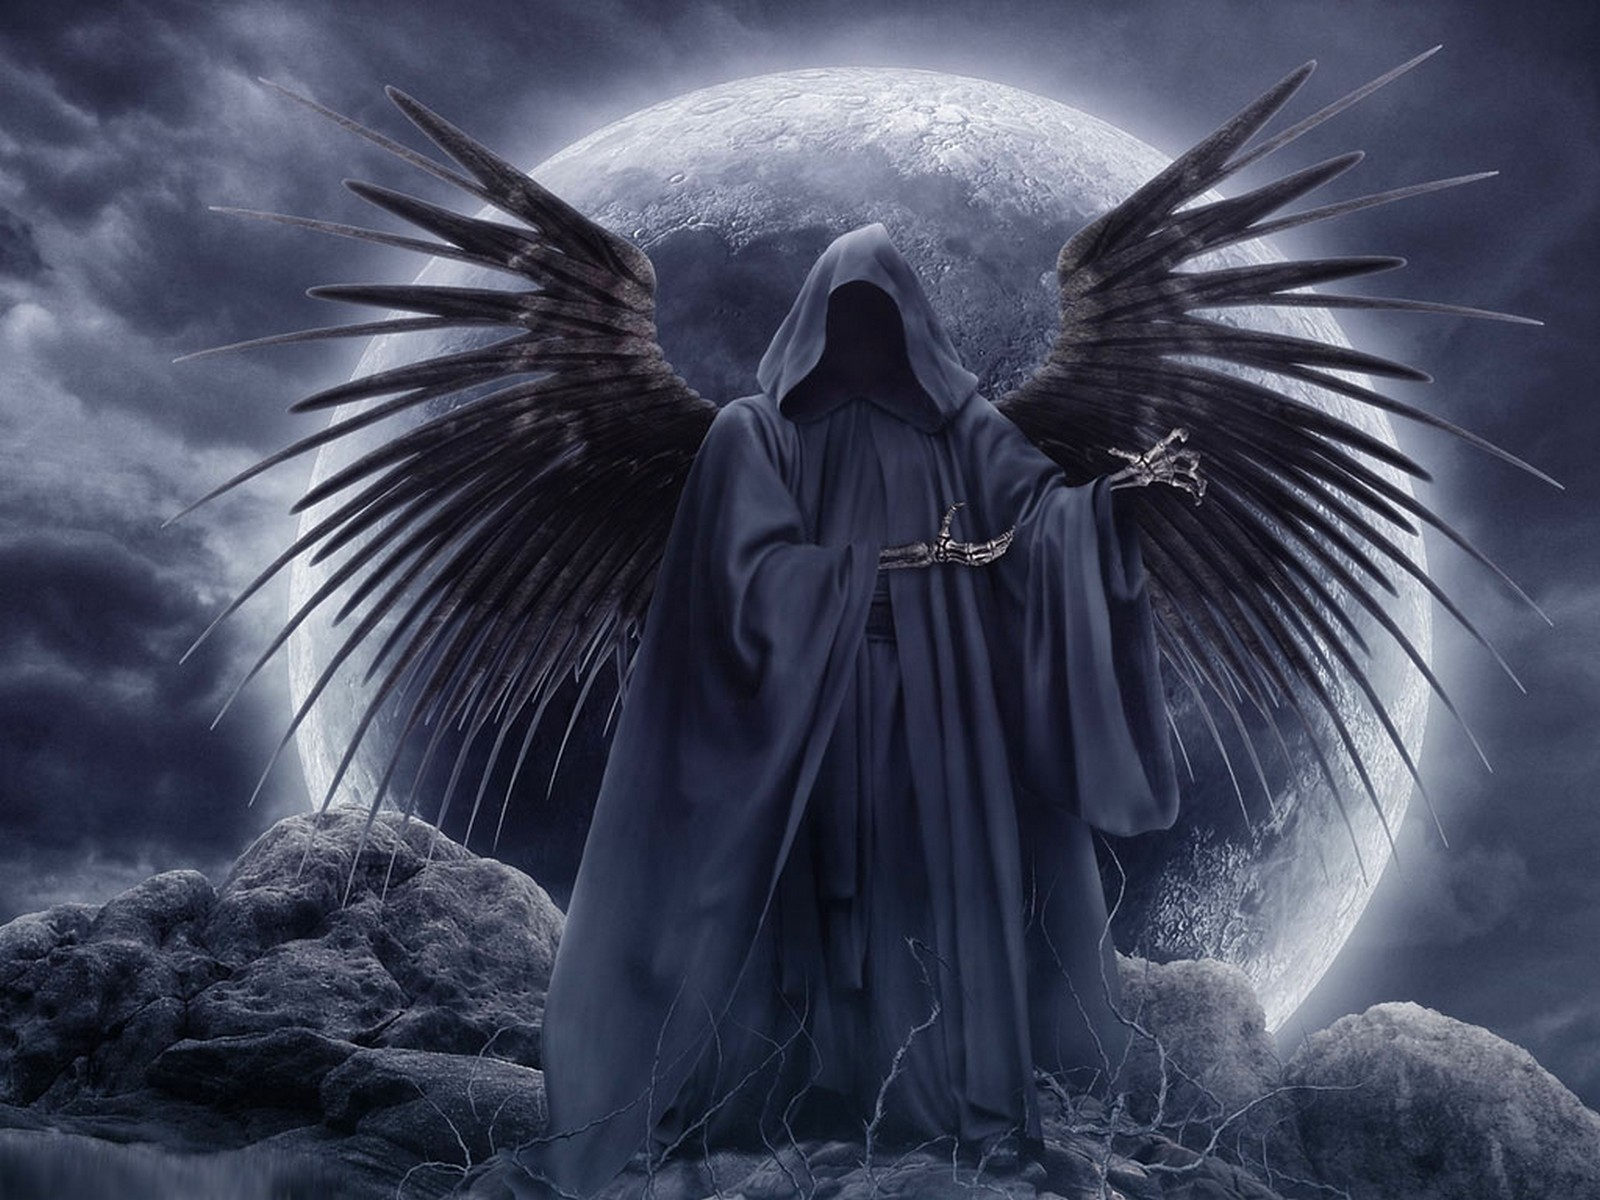 http://1.bp.blogspot.com/-ouX8LaFnXhc/Tql7HbQwhHI/AAAAAAAABqQ/GG0wOkA2rWA/s1600/grim-reaper-on-halloween.jpg